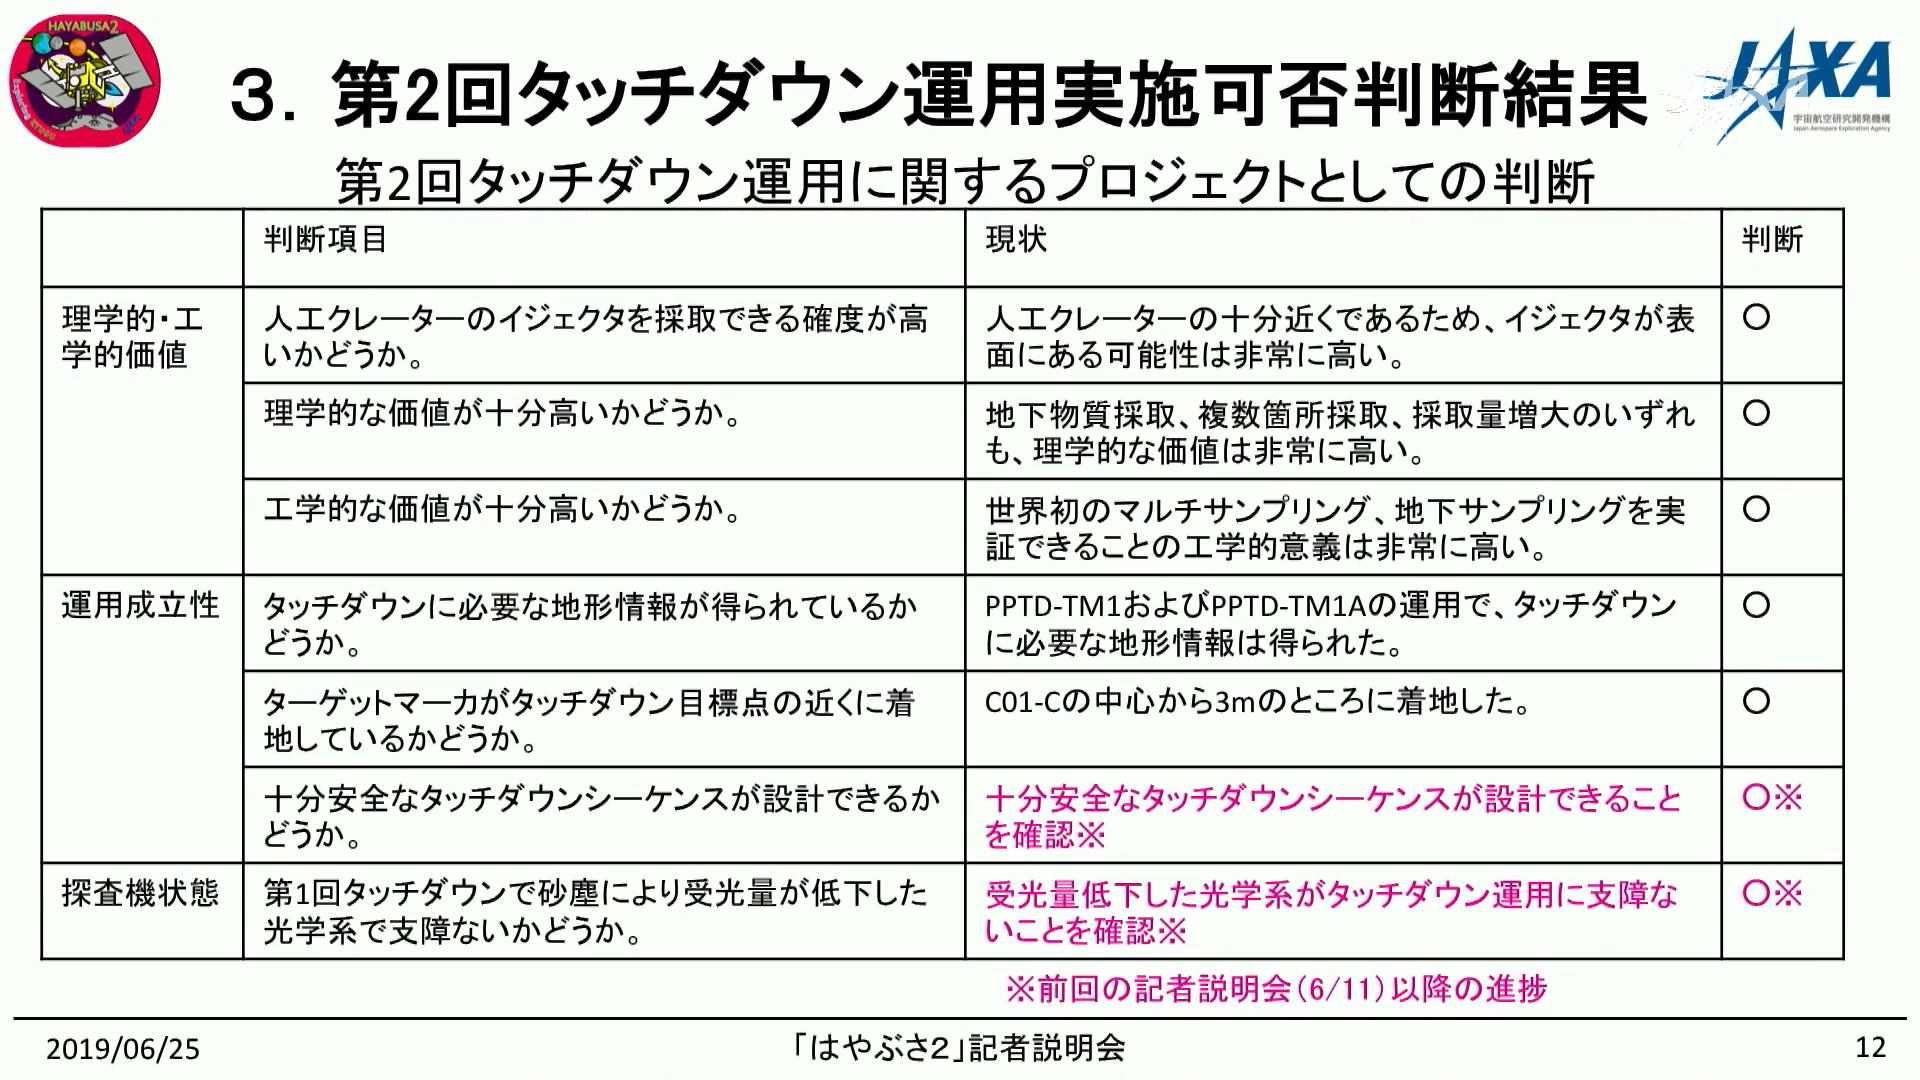 f:id:Imamura:20190625234735p:plain